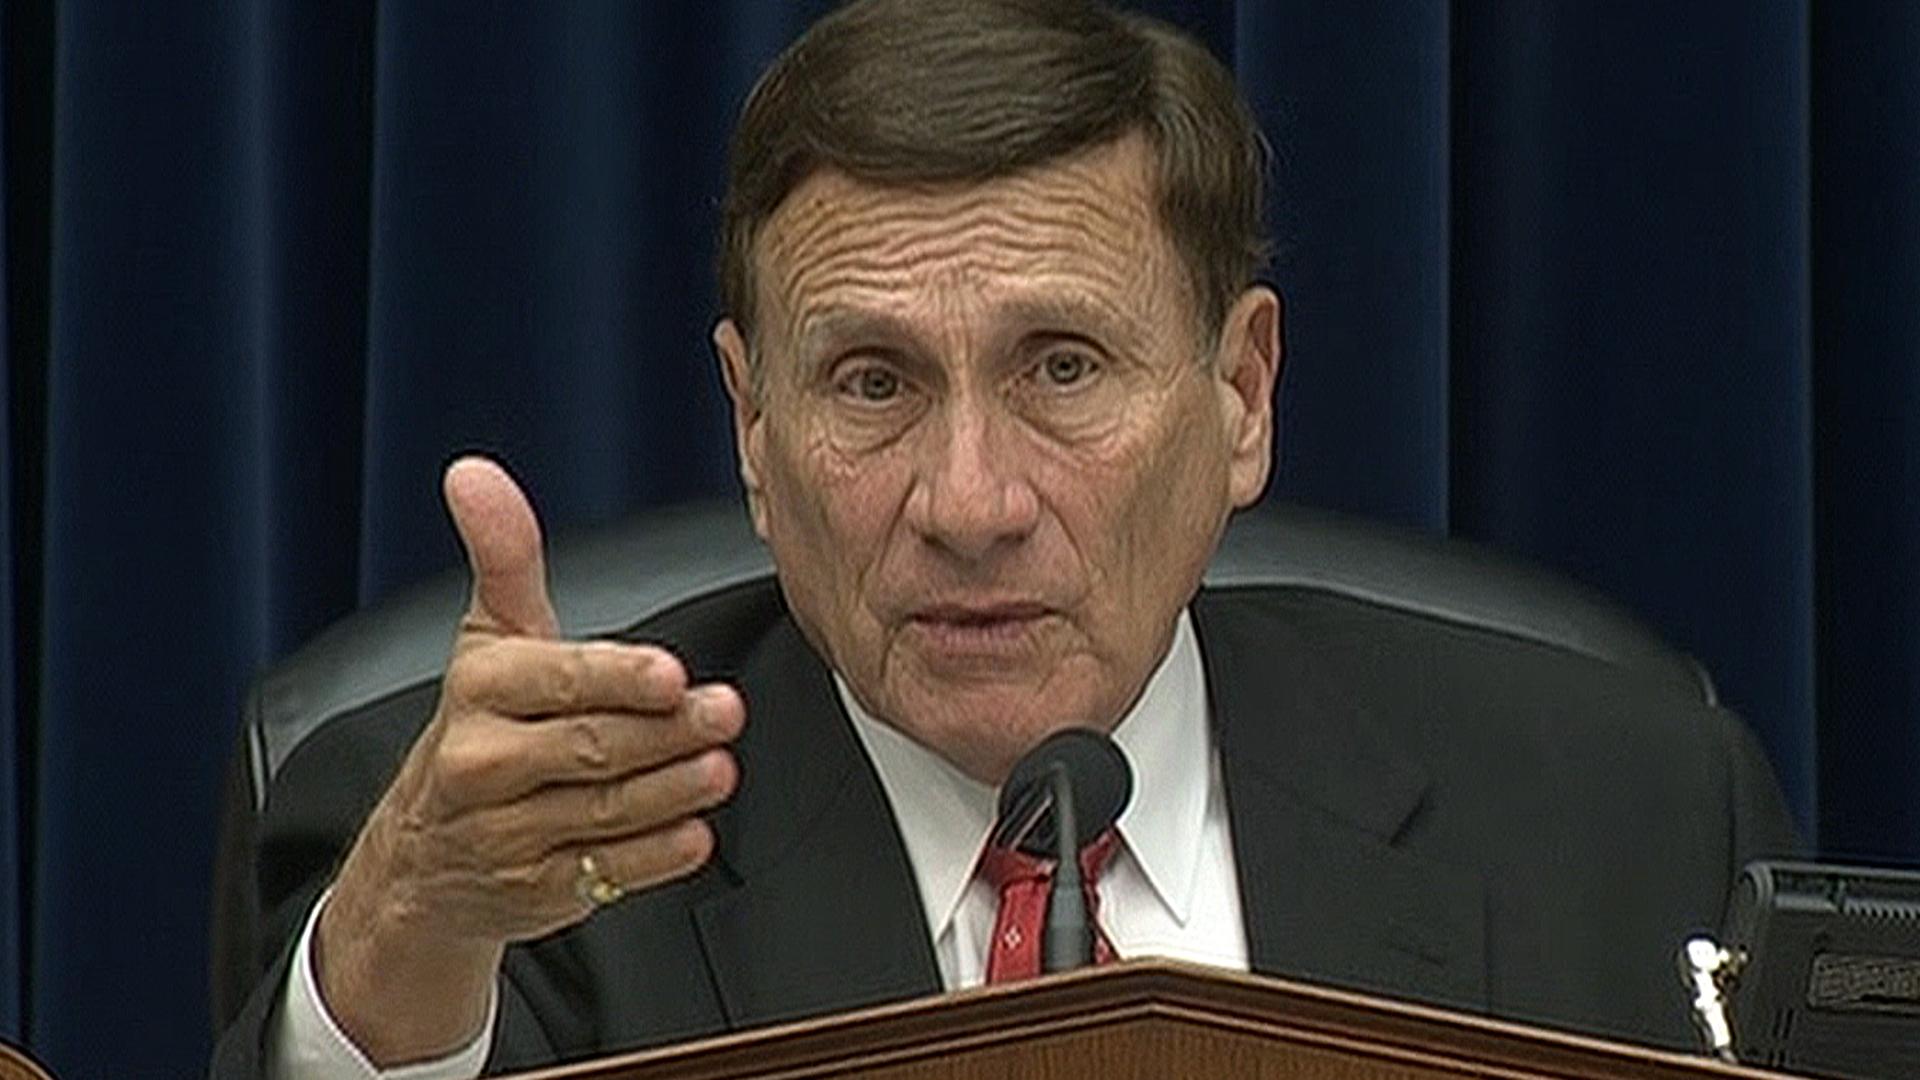 Drug Driving? Congress Debates Dangers of Driving Stoned